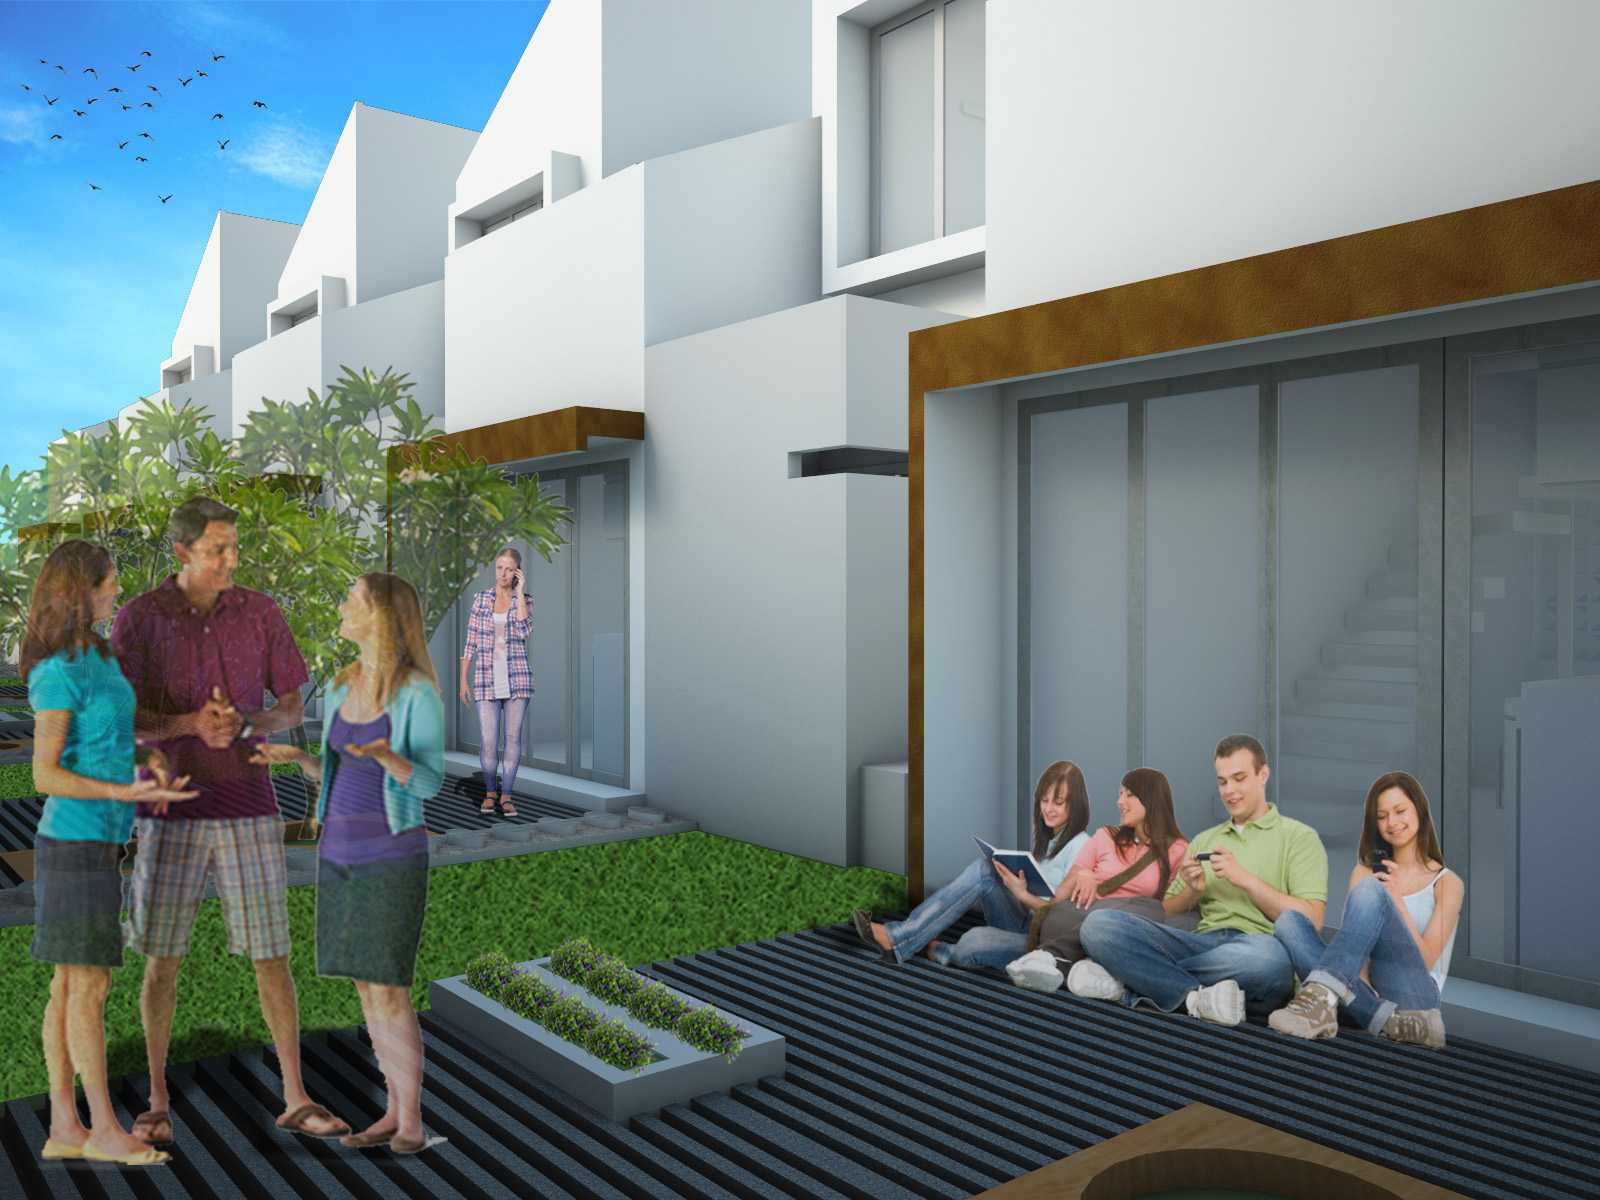 Vishaka Architect Studio Multi Unit Housing 1 Surabaya, Indonesia Surabaya, Indonesia T36-Havila-Bg   23087